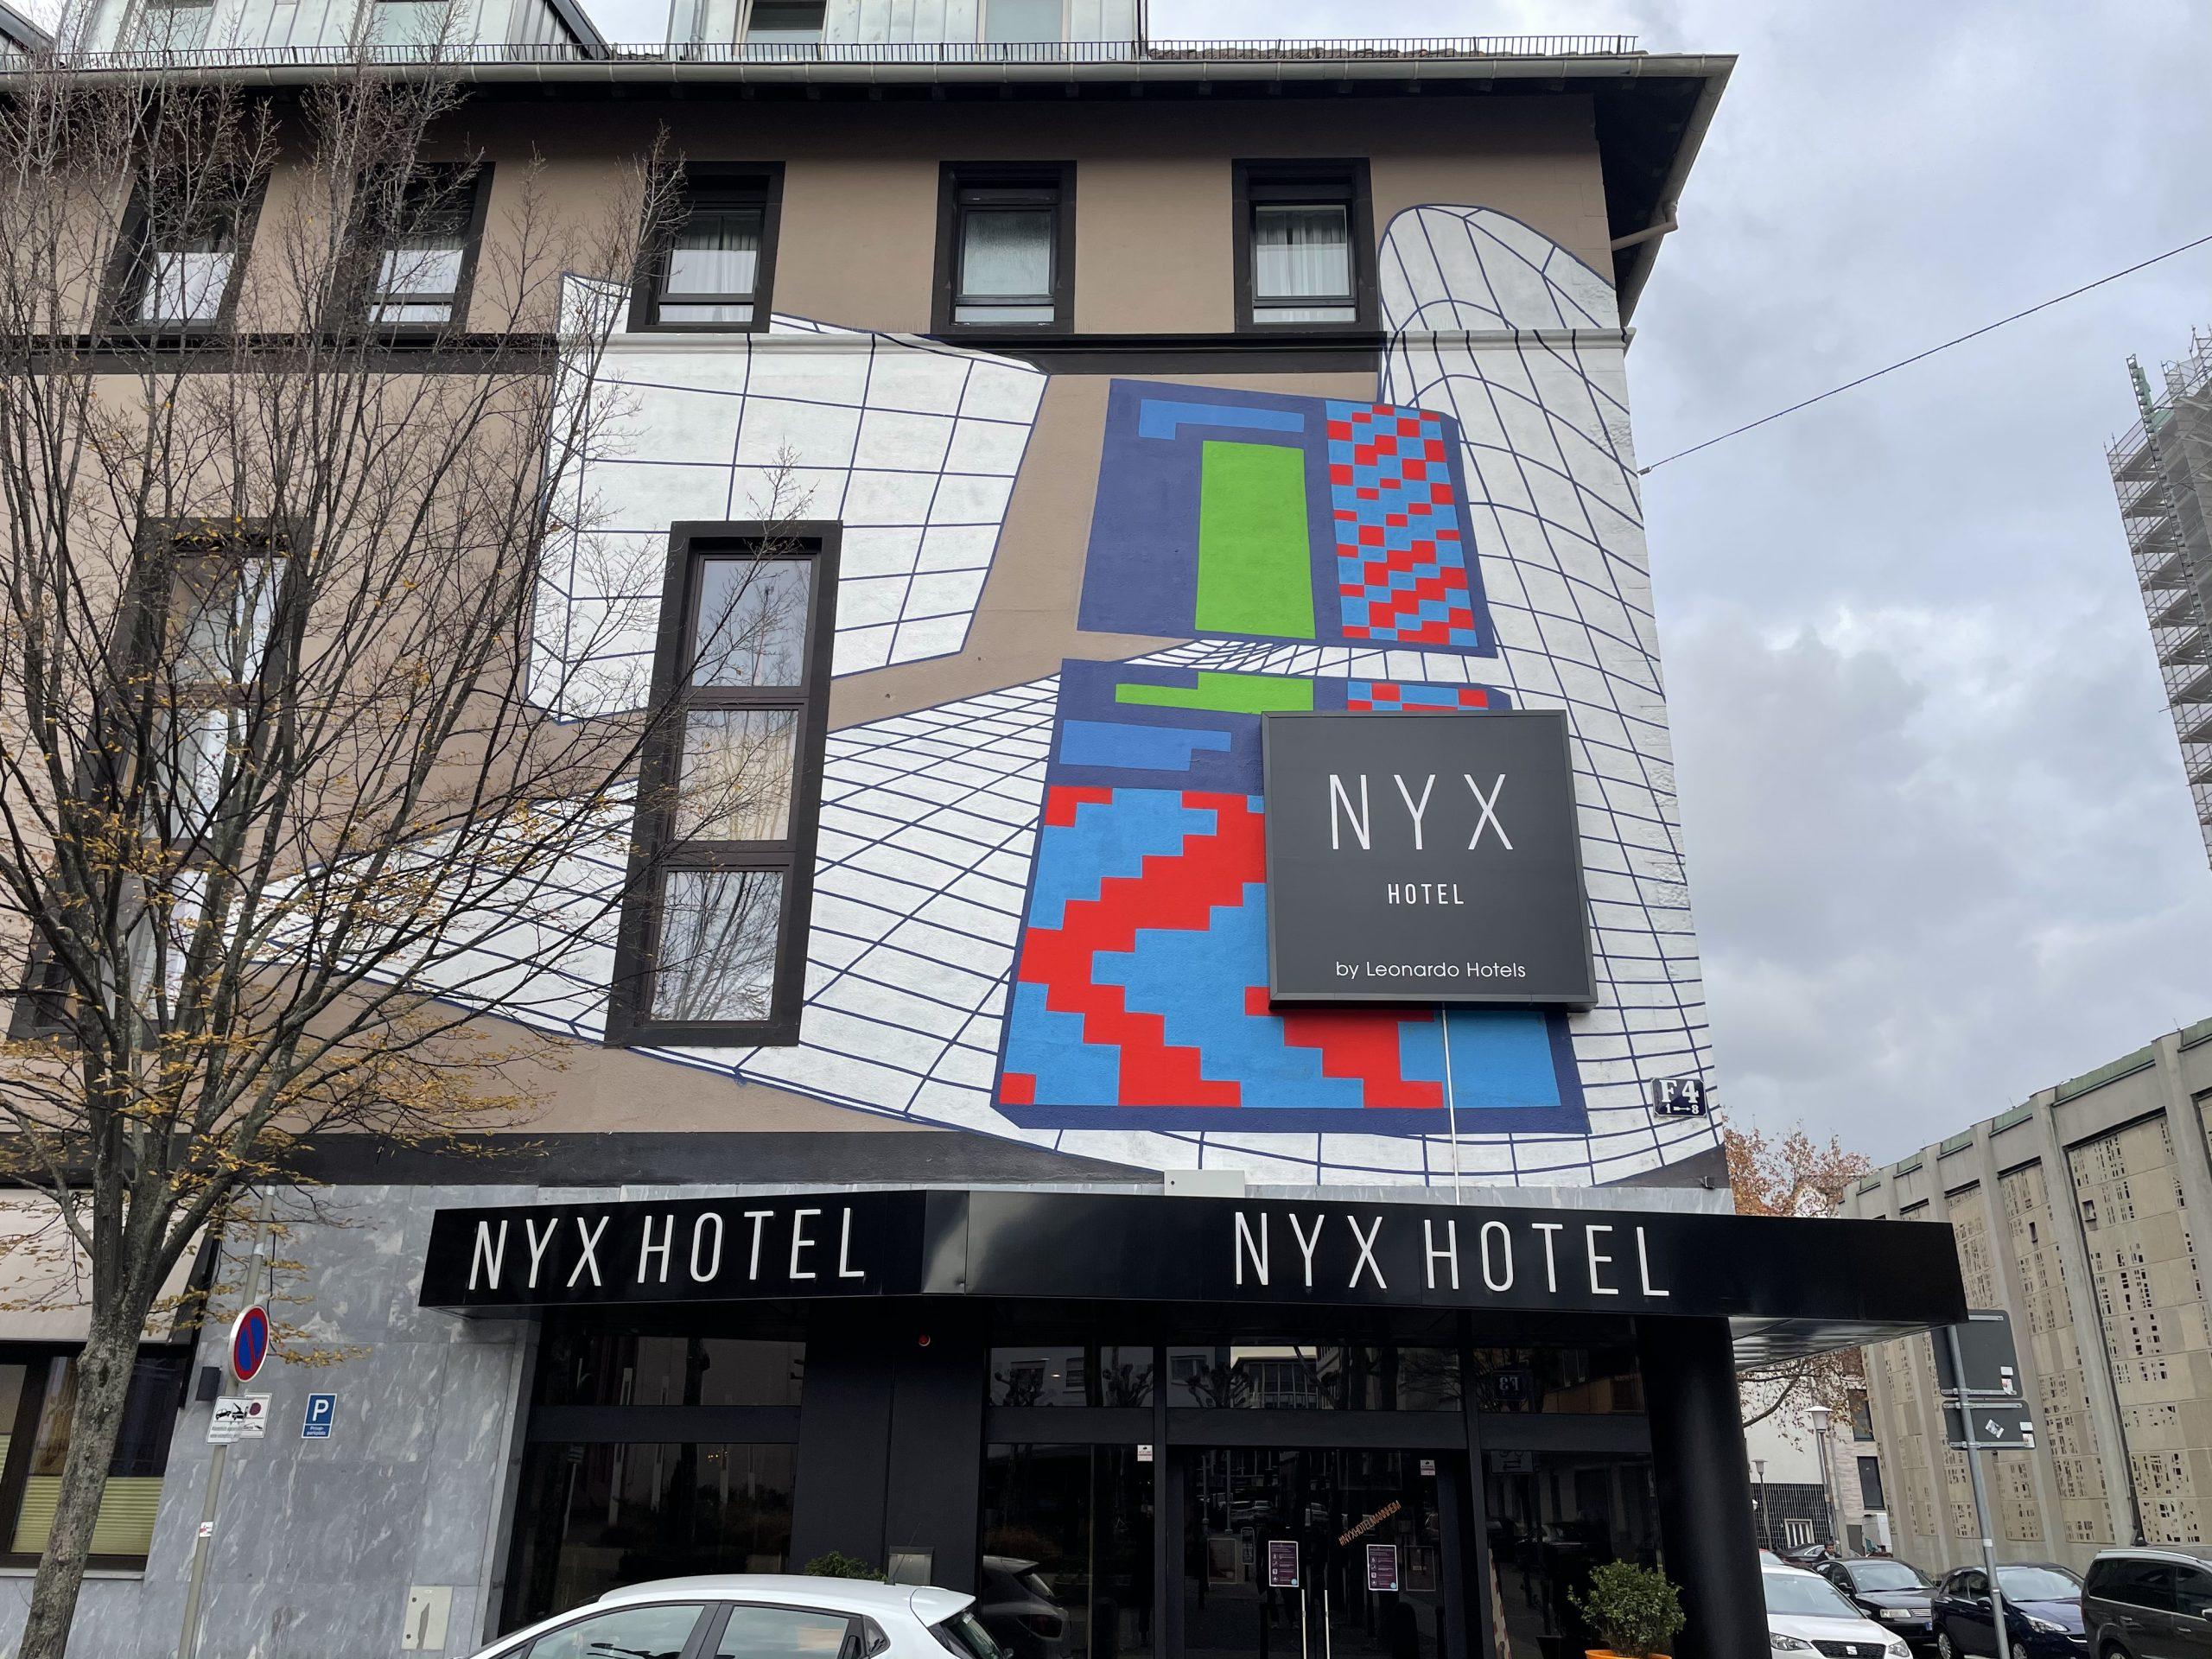 DEMSKY_NYX Hotel Mannheim